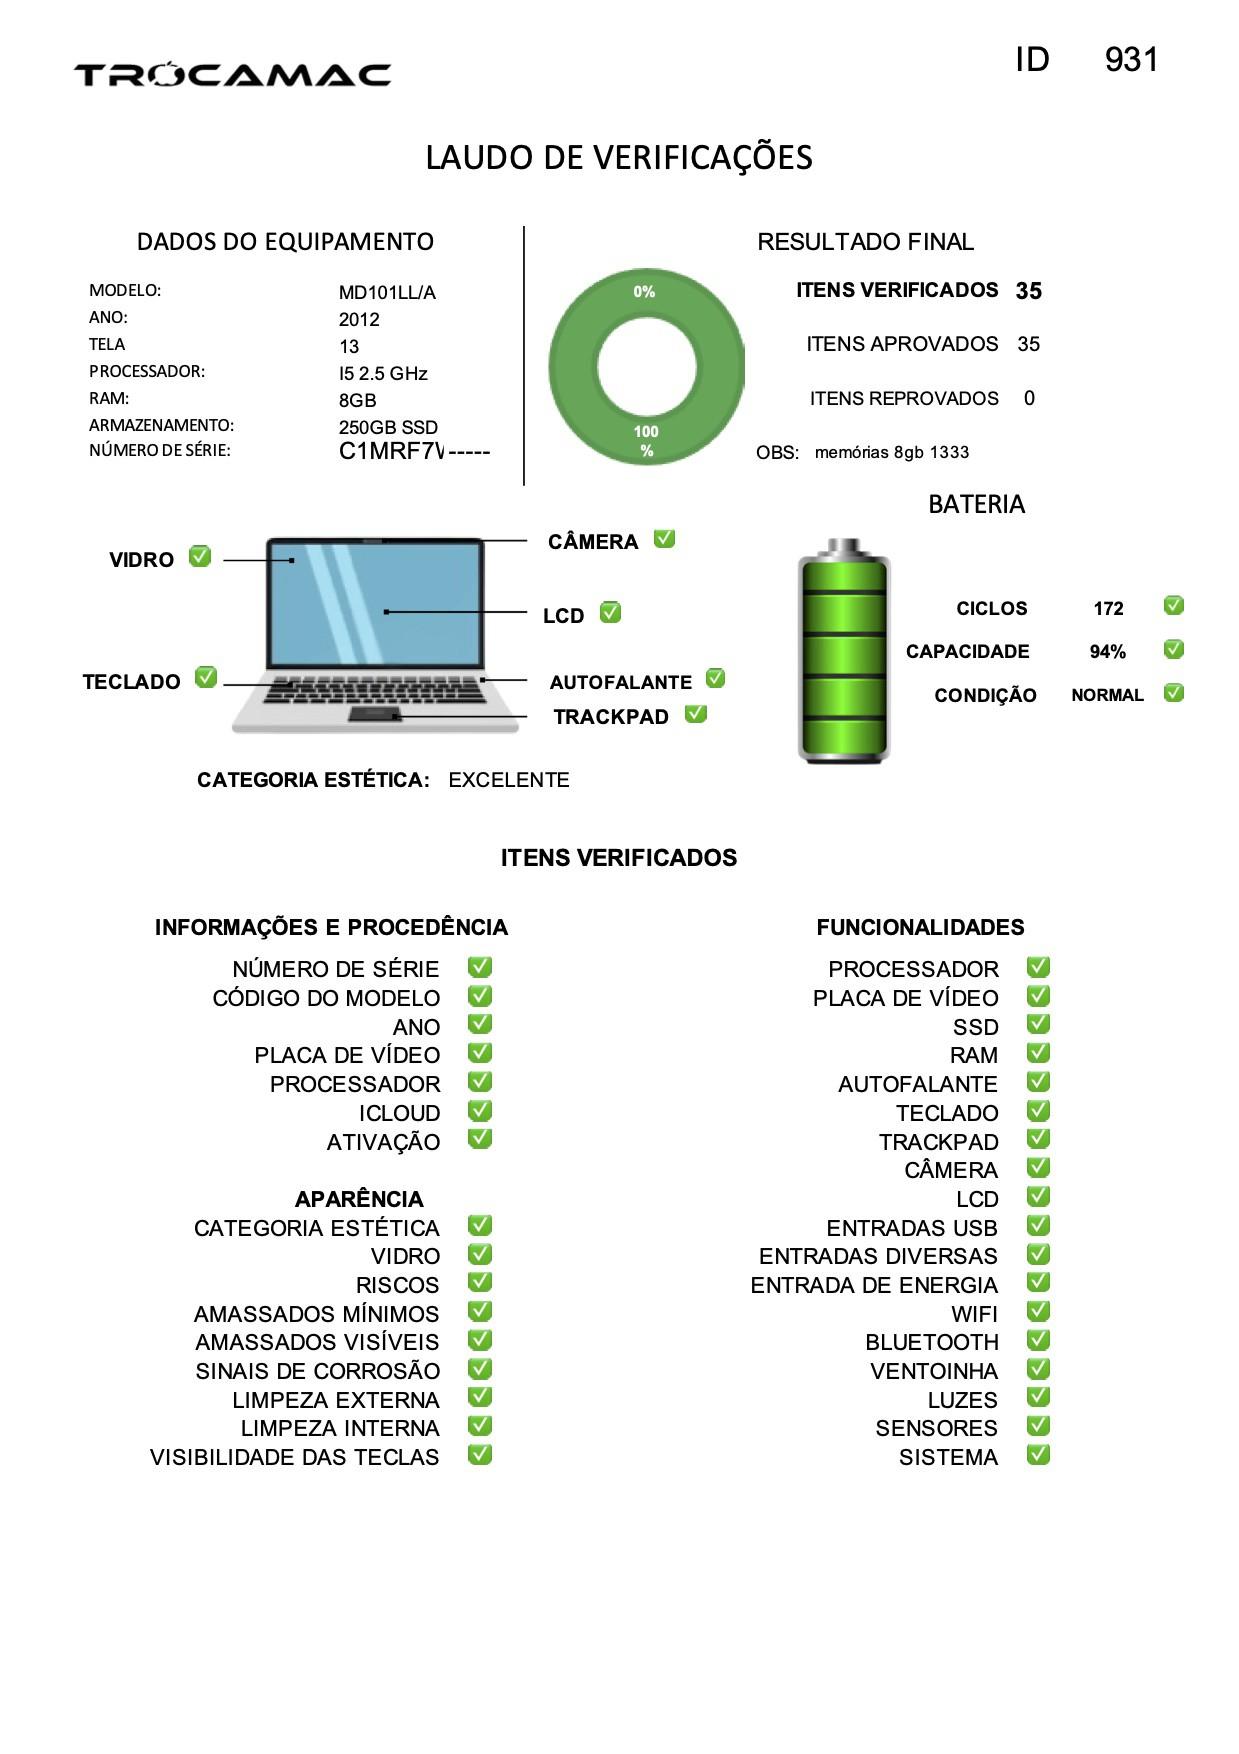 Macbook Pro 13 i5 2.5GHZ 8GB 256GB SSD MD101 Seminovo